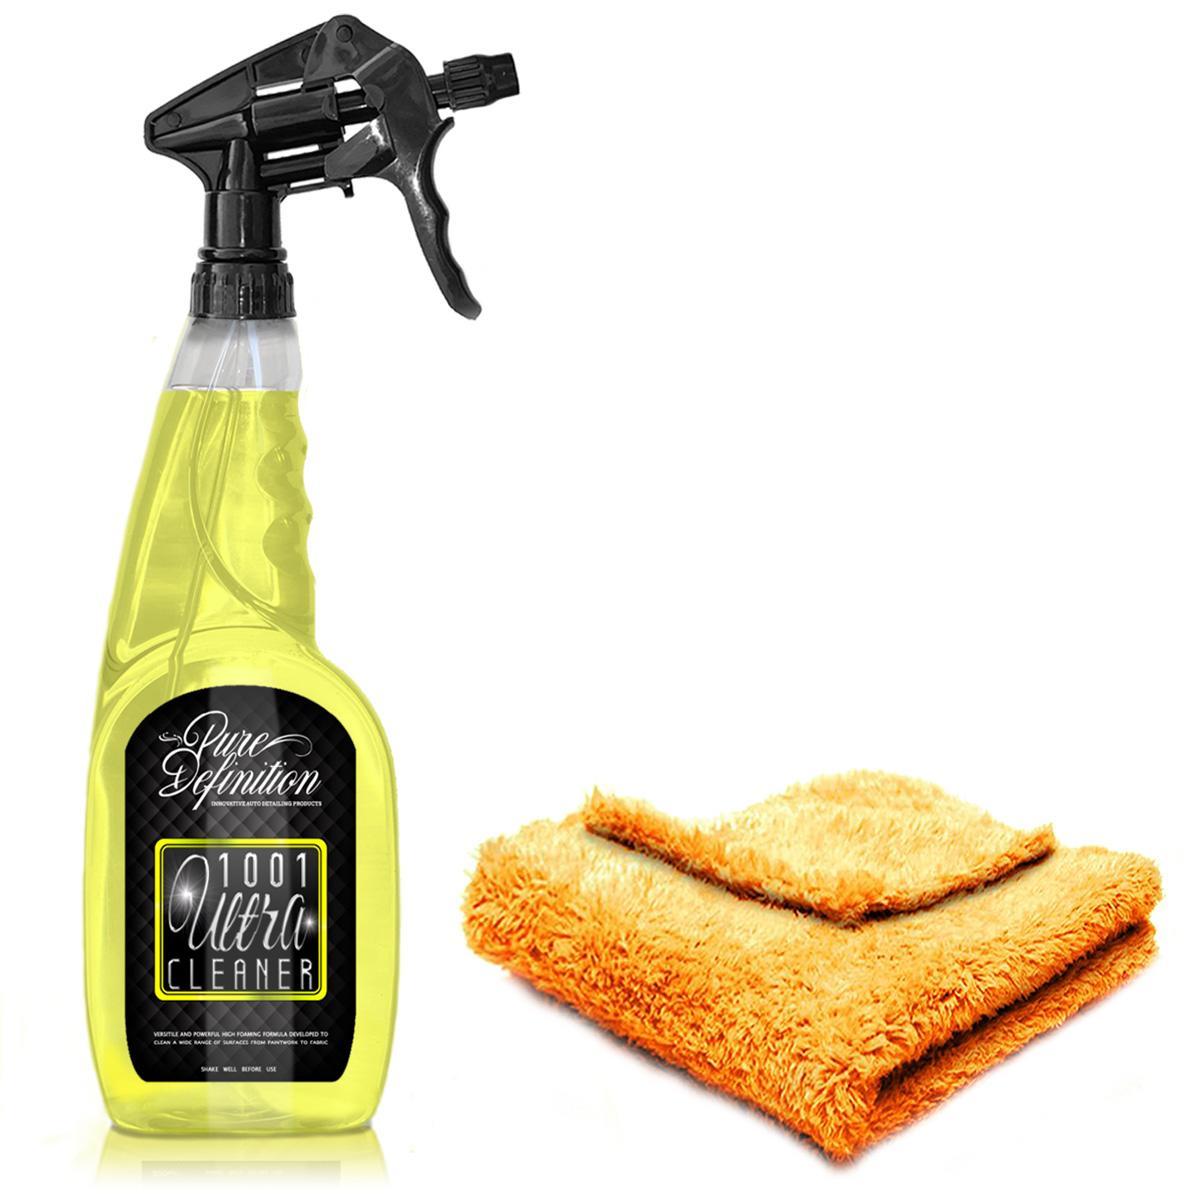 gloss-wash-shampoo-800-hq.jpg